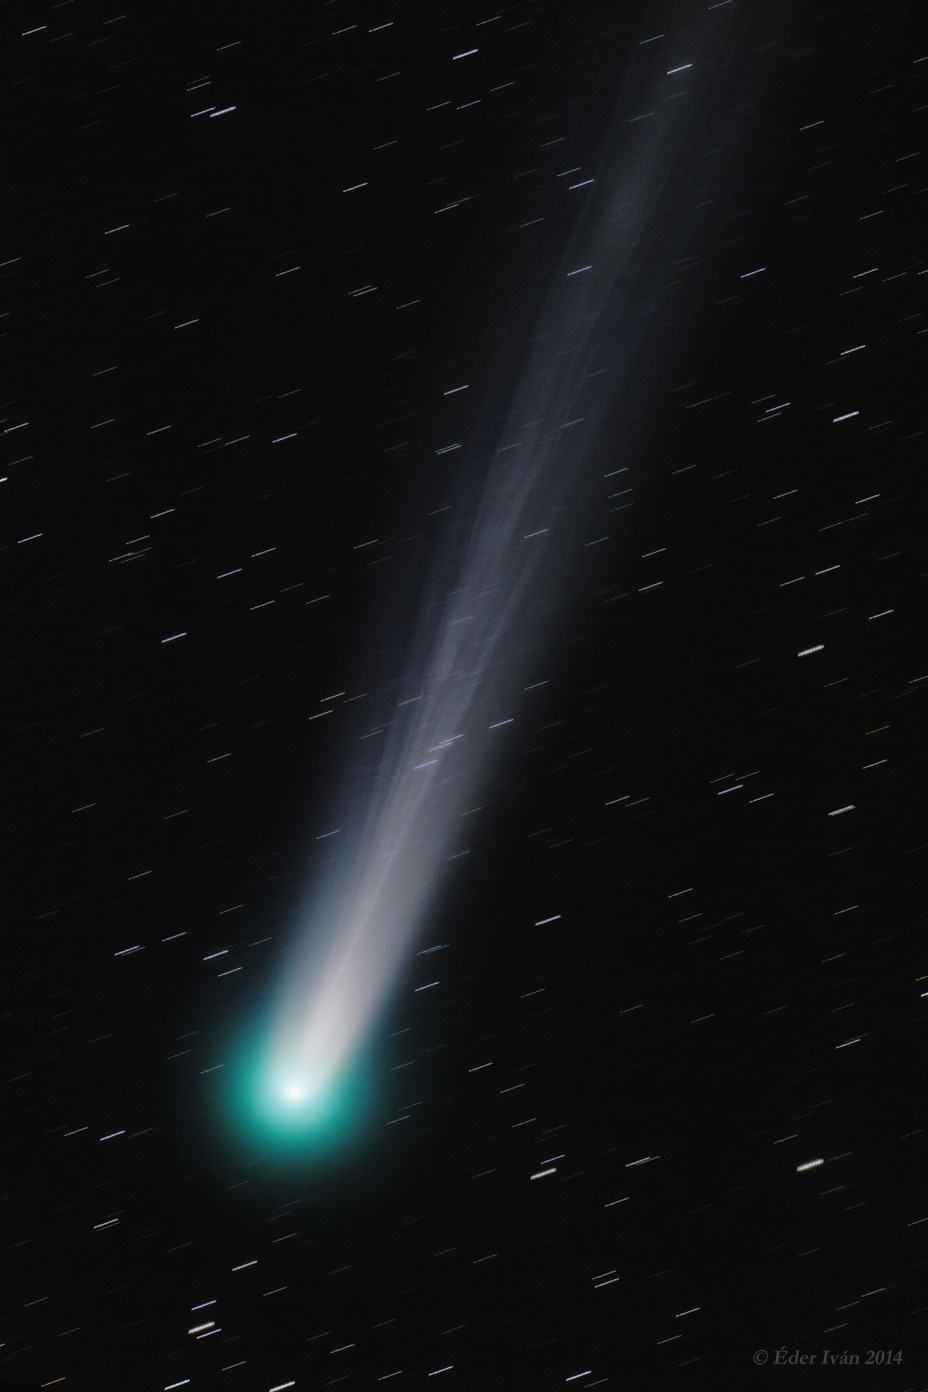 Comet Lovejoy C2013 R1